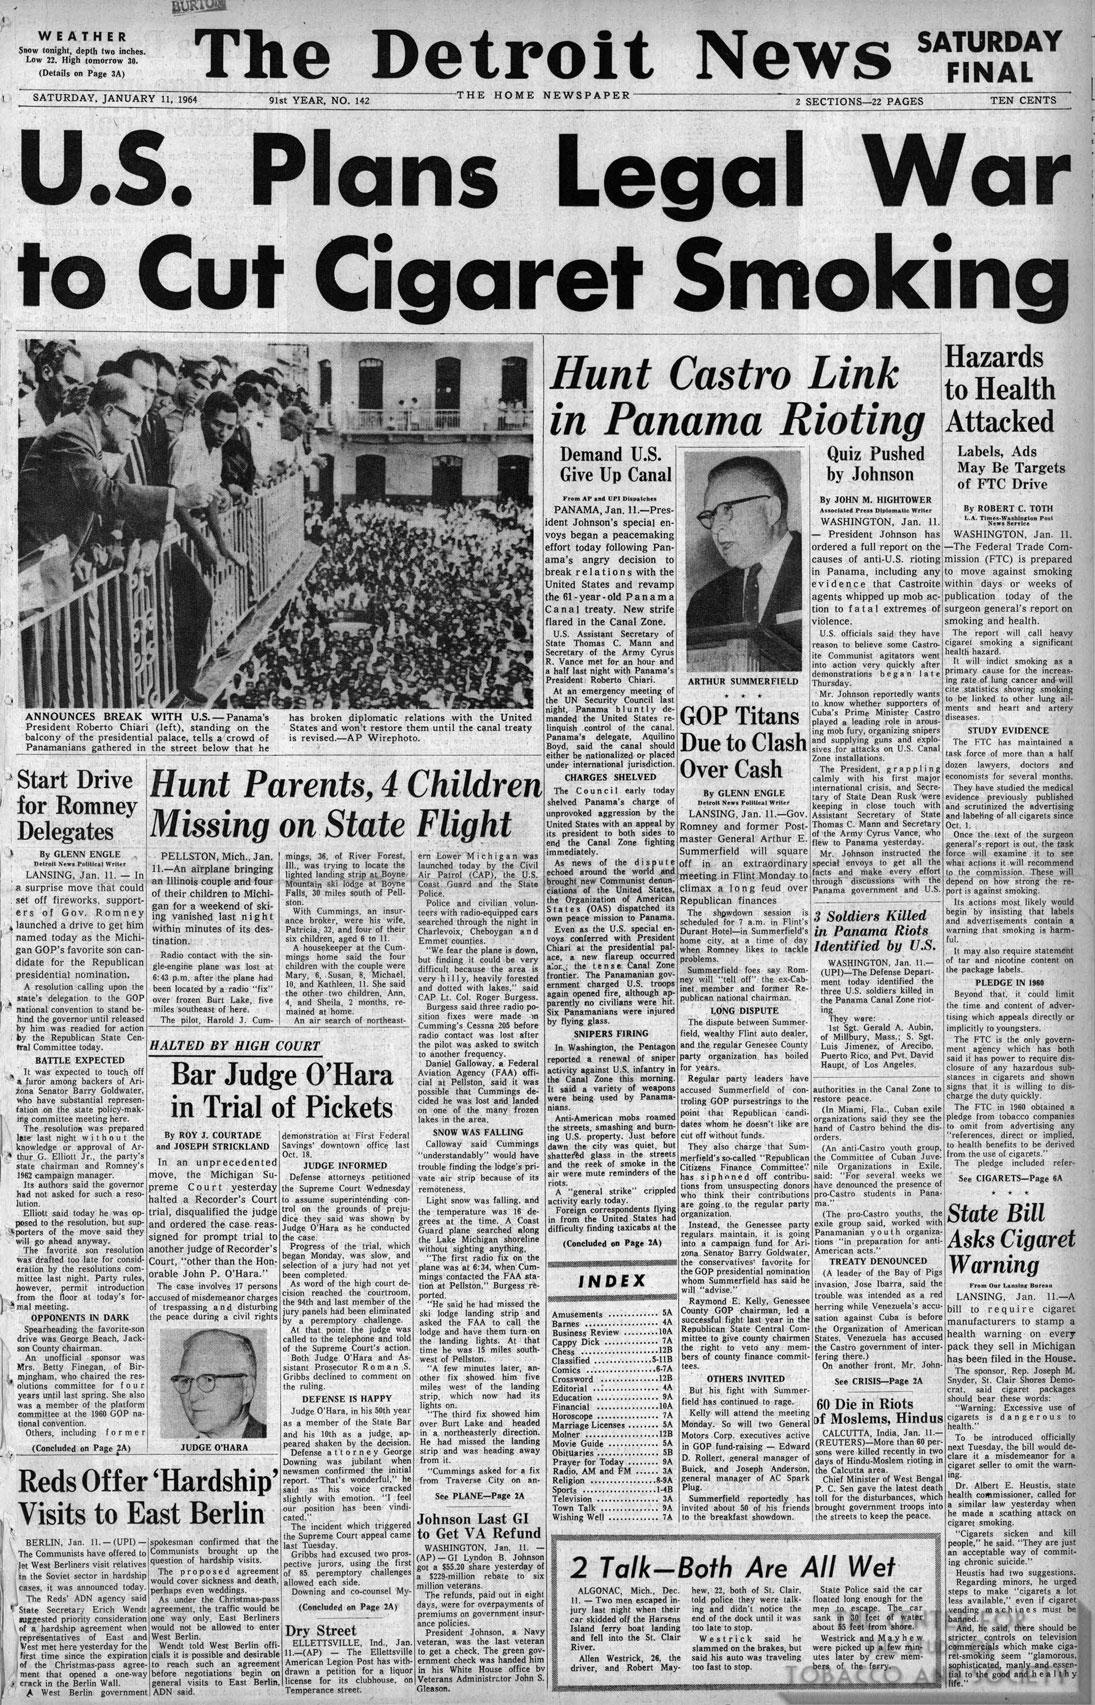 1964 01 11 Detroit News US Plans Legal War to Cut Smoking resized